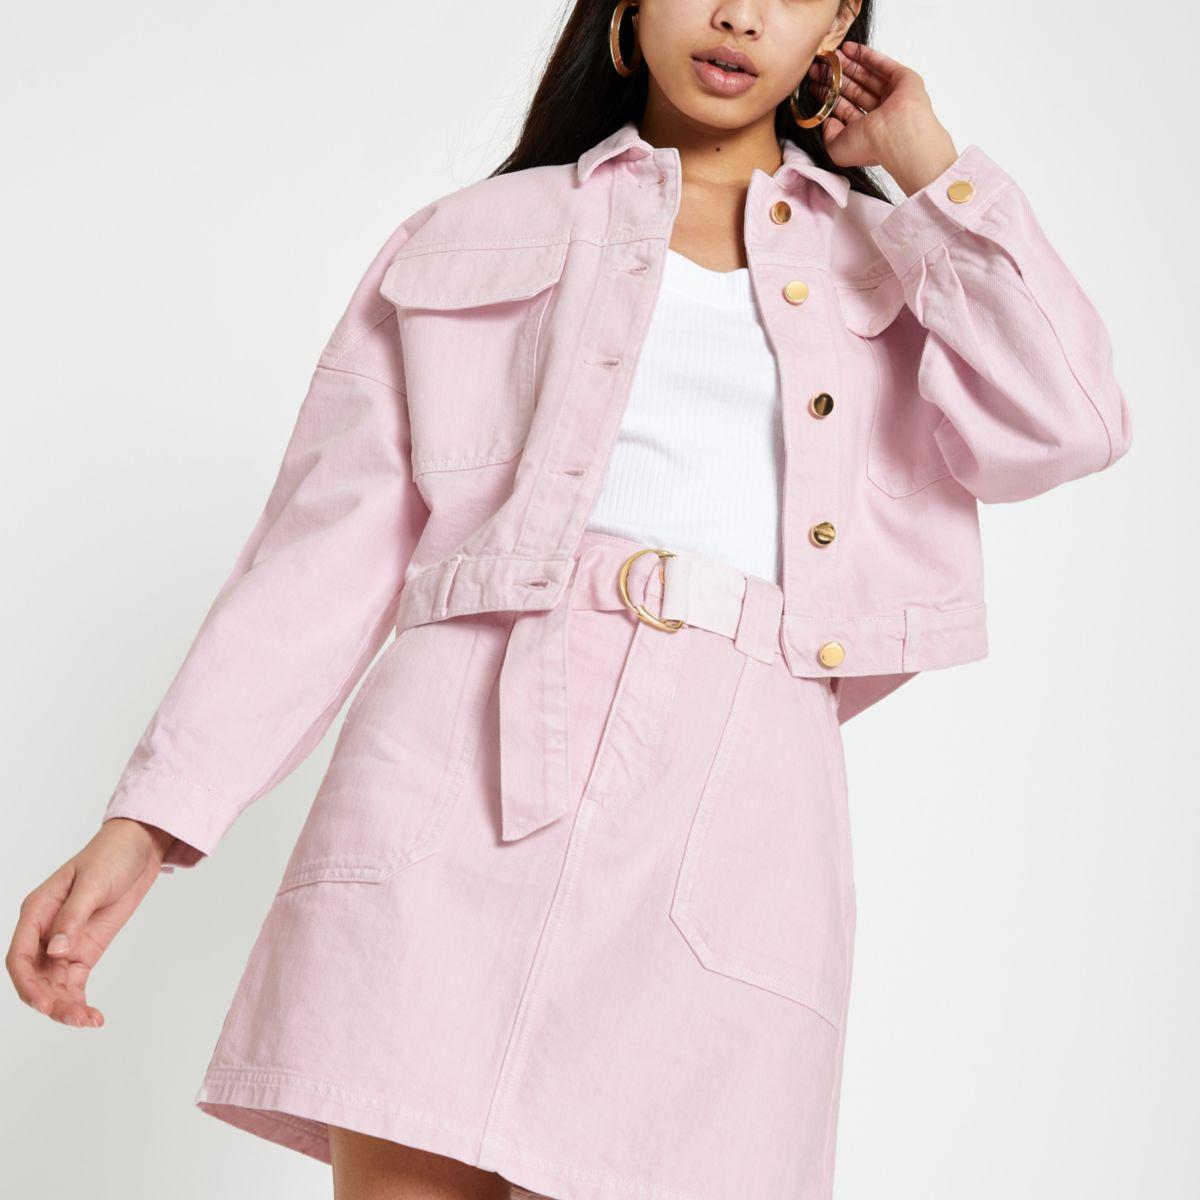 Pink oversized denim jacket